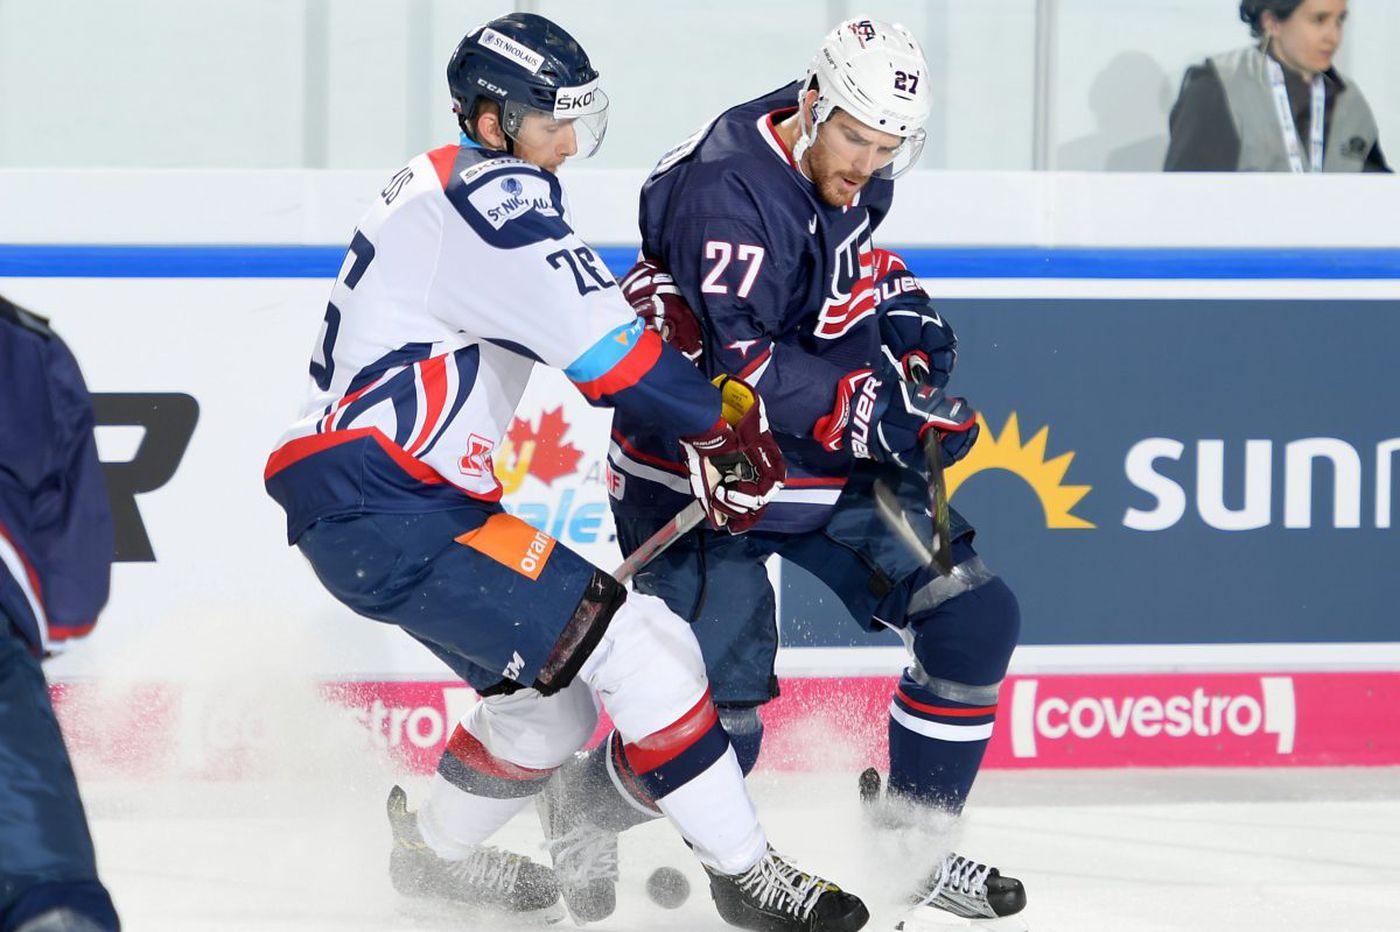 New Jersey ice hockey star Bobby Sanguinetti wants to bloom at the 2018 Olympics